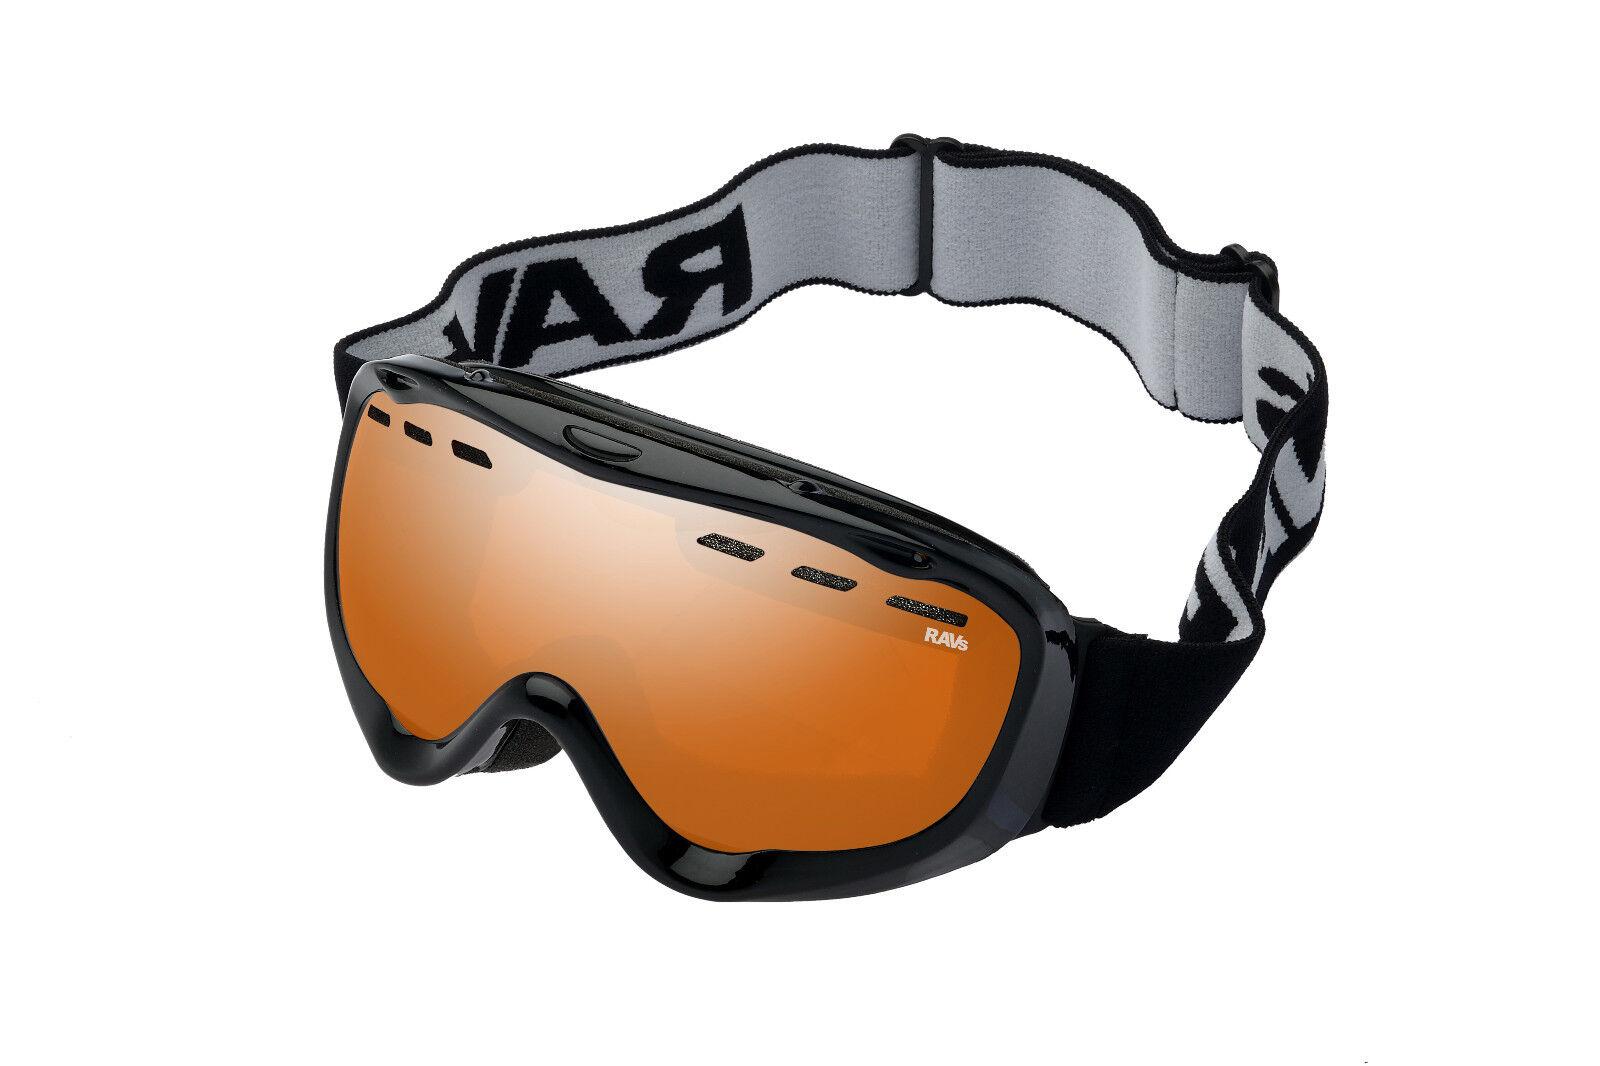 Ravs Skibrille Snowboardbrille  Schneebrille Schutzbrille Ski  goggles Kontrast